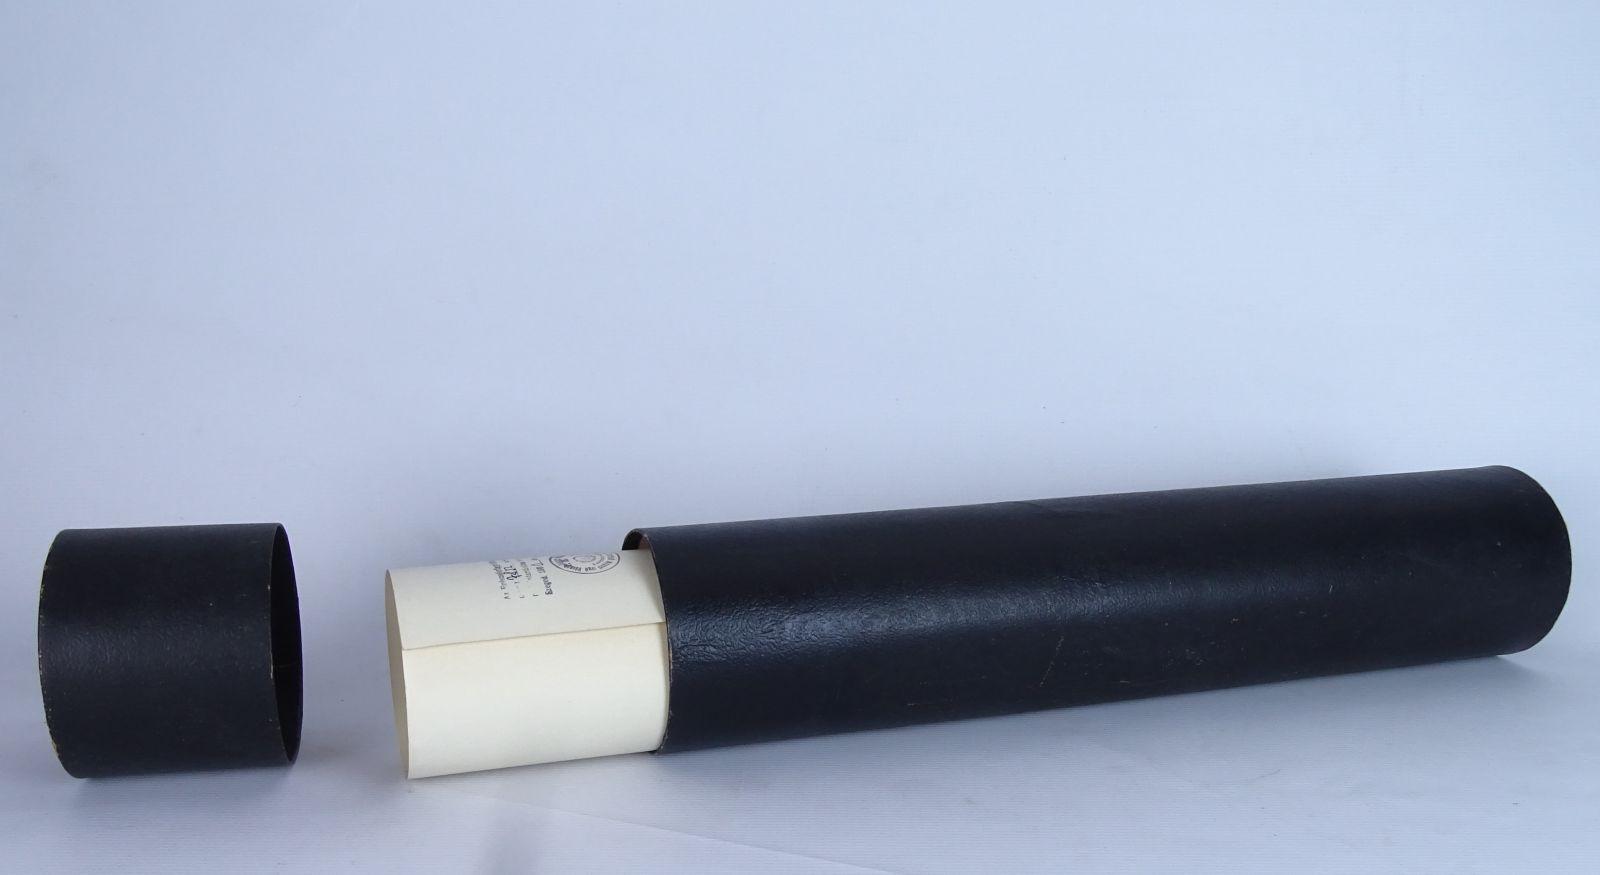 DSC00836.JPG (1600×875)